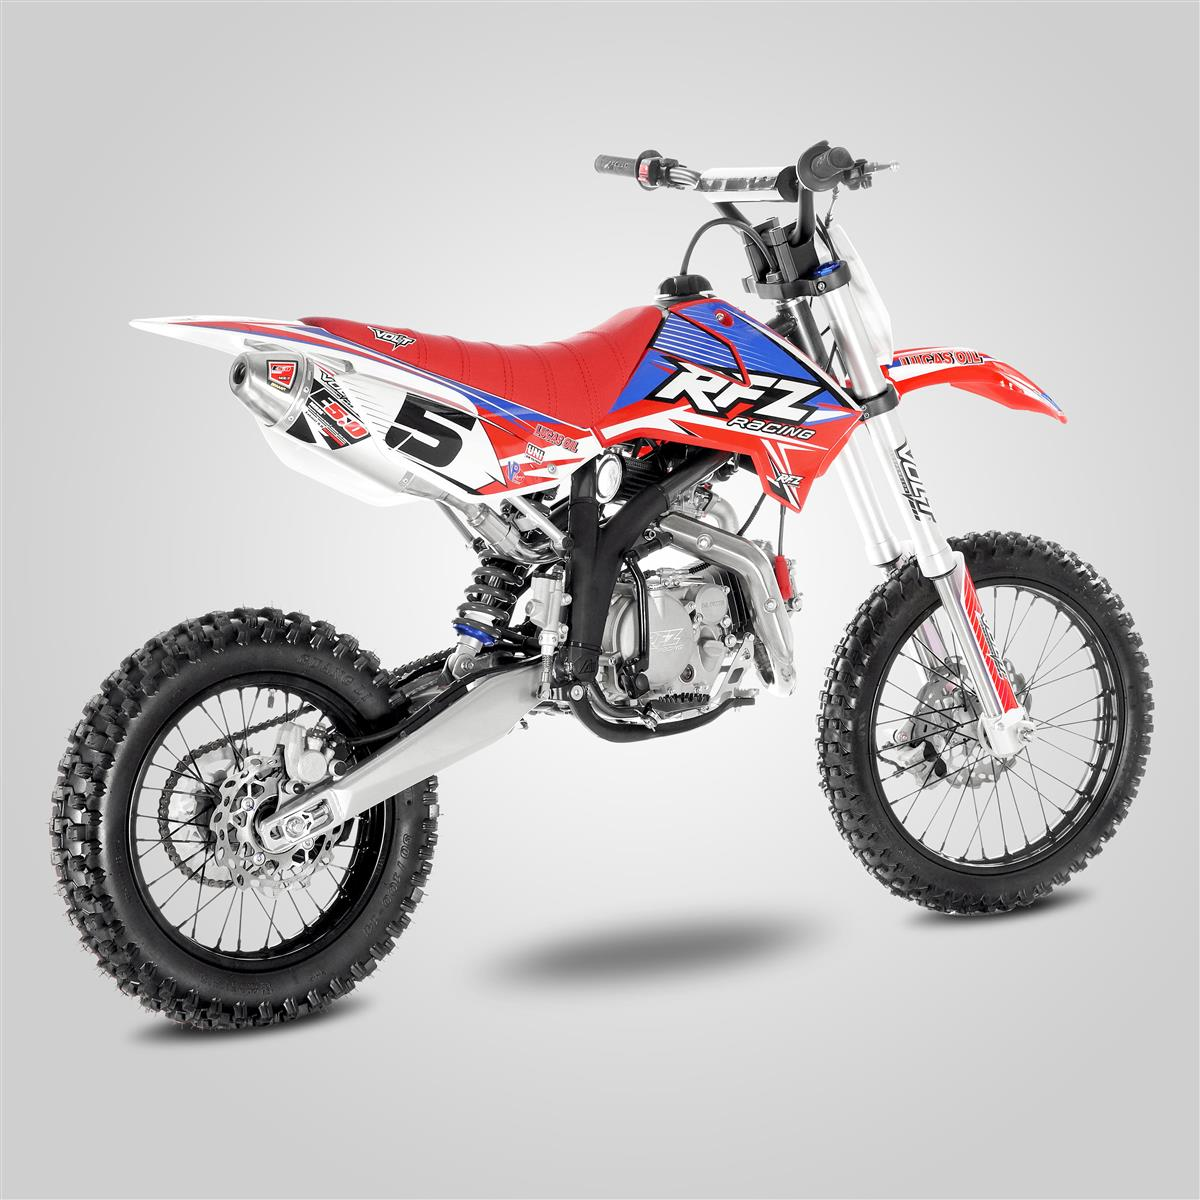 minicross apollo rfz open lwb 150 14 17 smallmx dirt bike pit bike quads minimoto. Black Bedroom Furniture Sets. Home Design Ideas